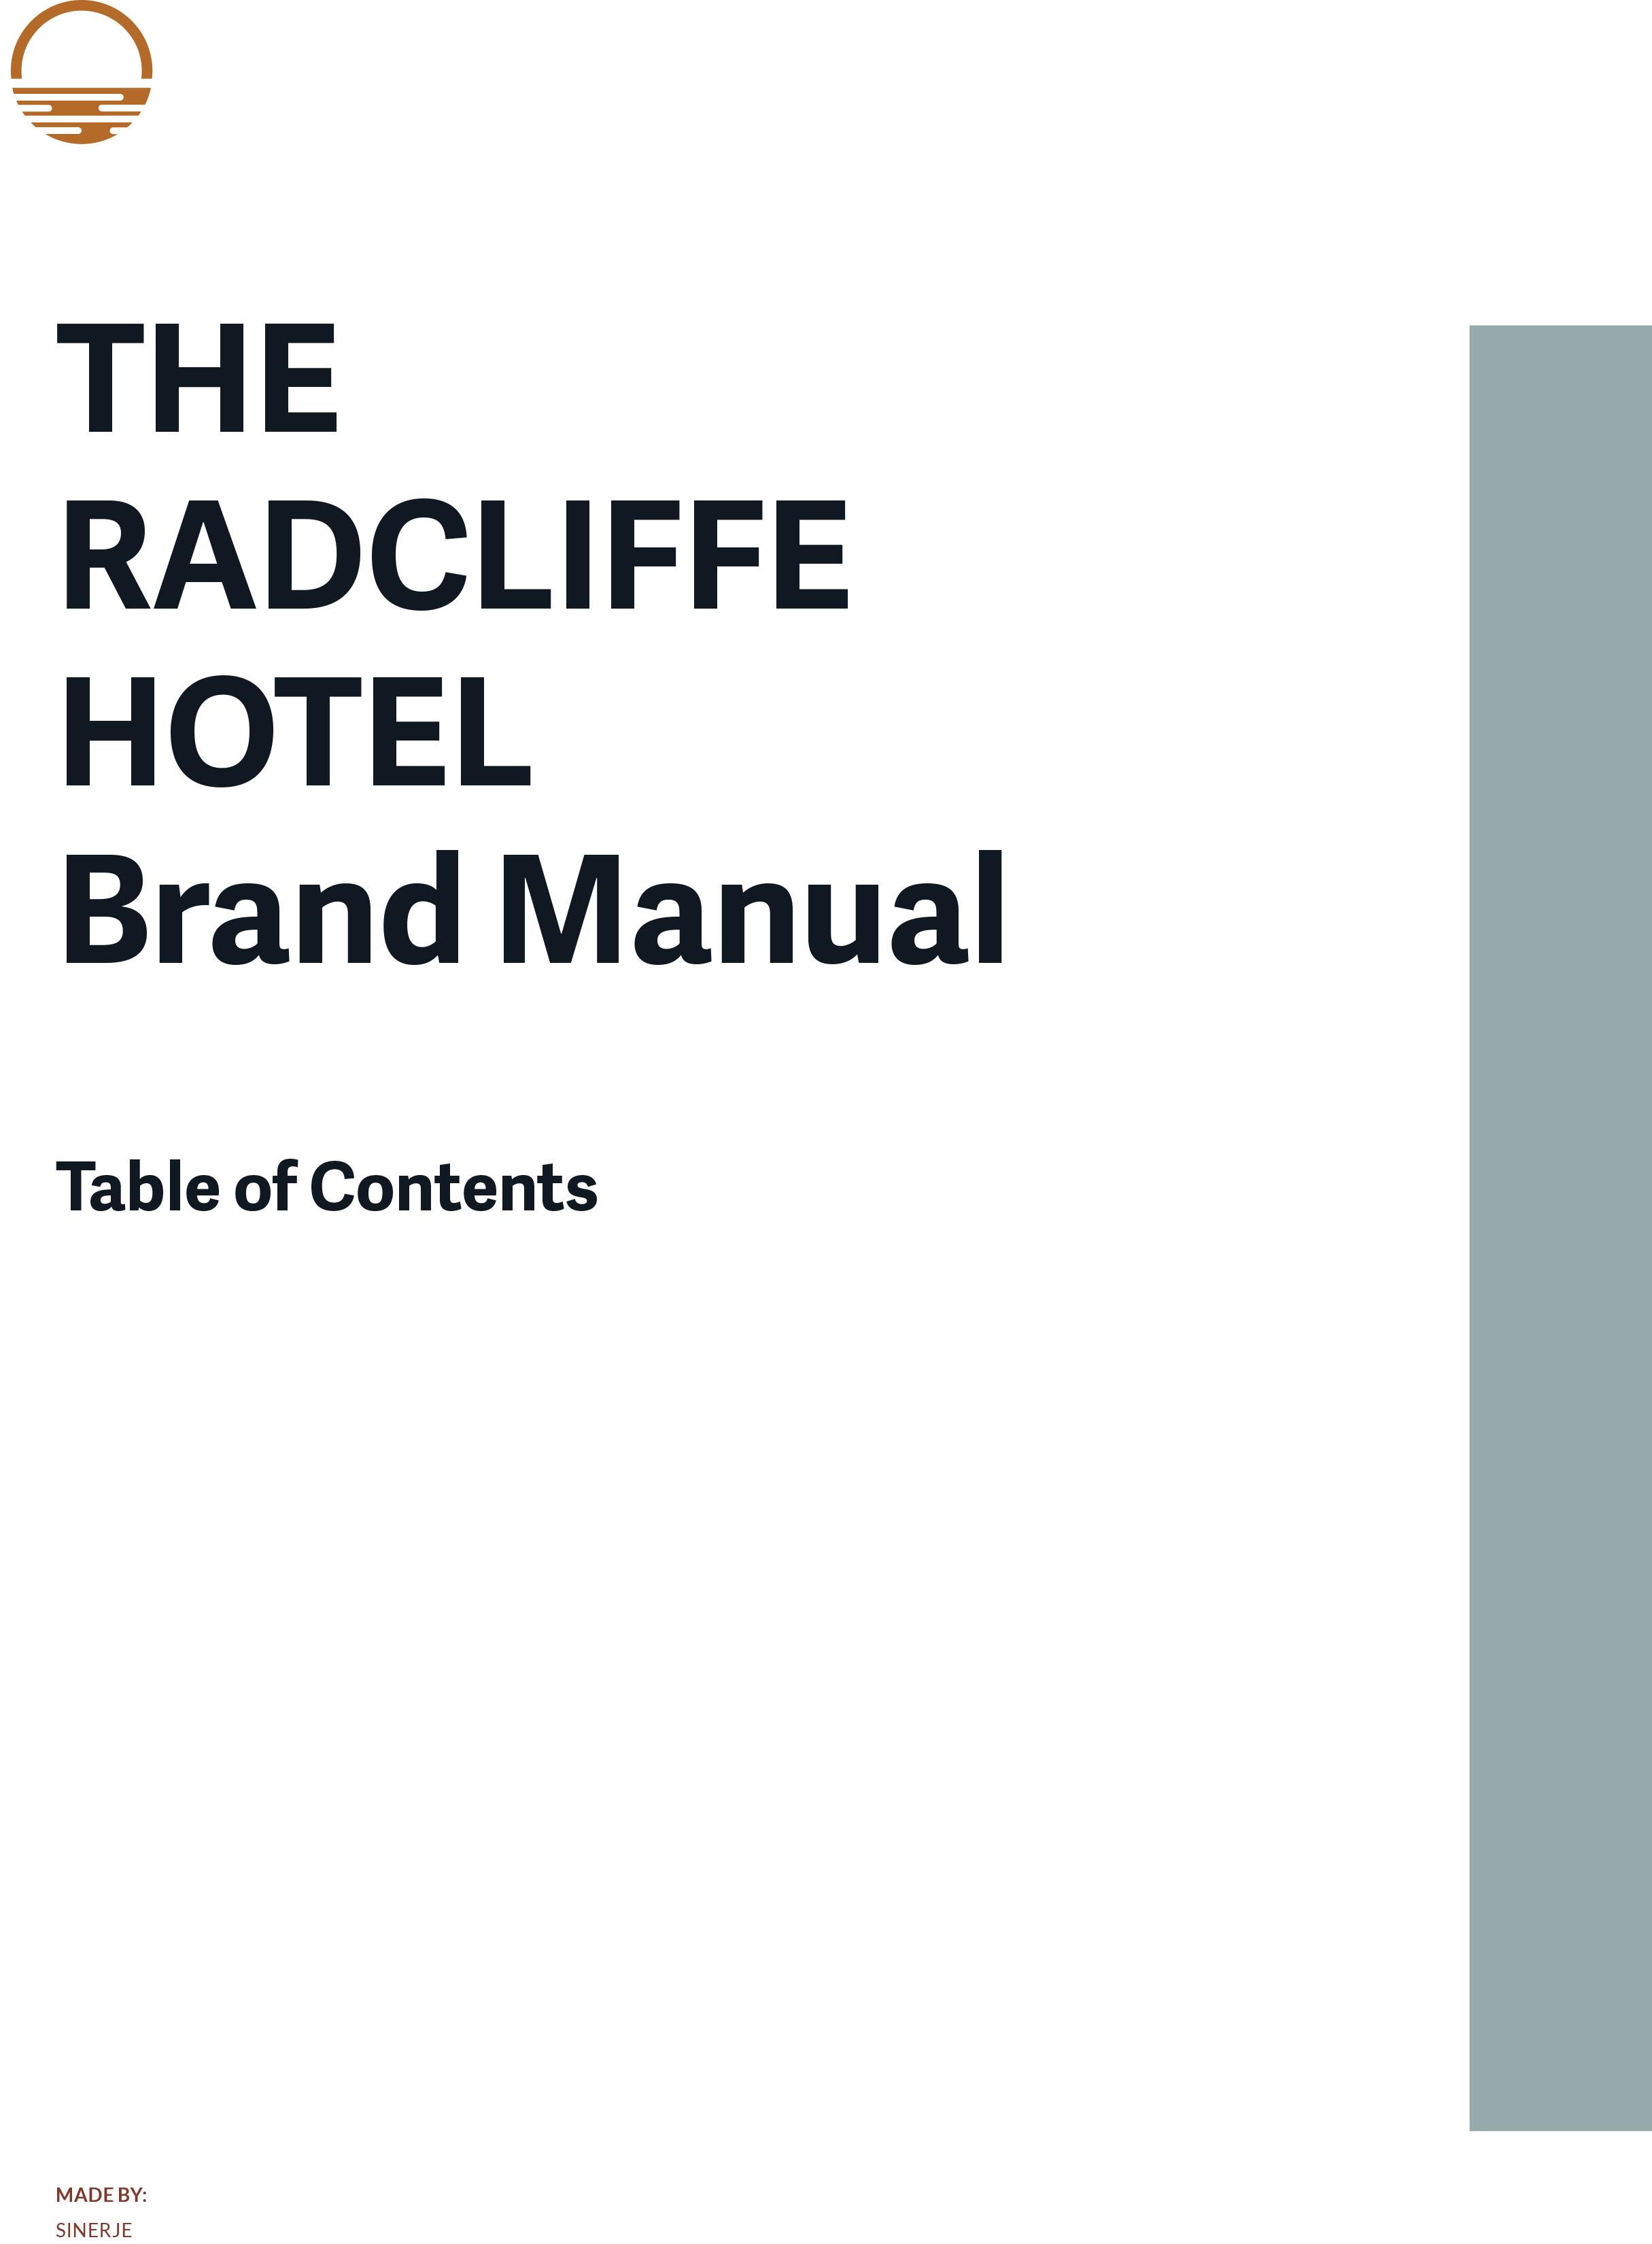 Radcliffe Hotels Brand Manual v2.0 Single Pages-4.jpg